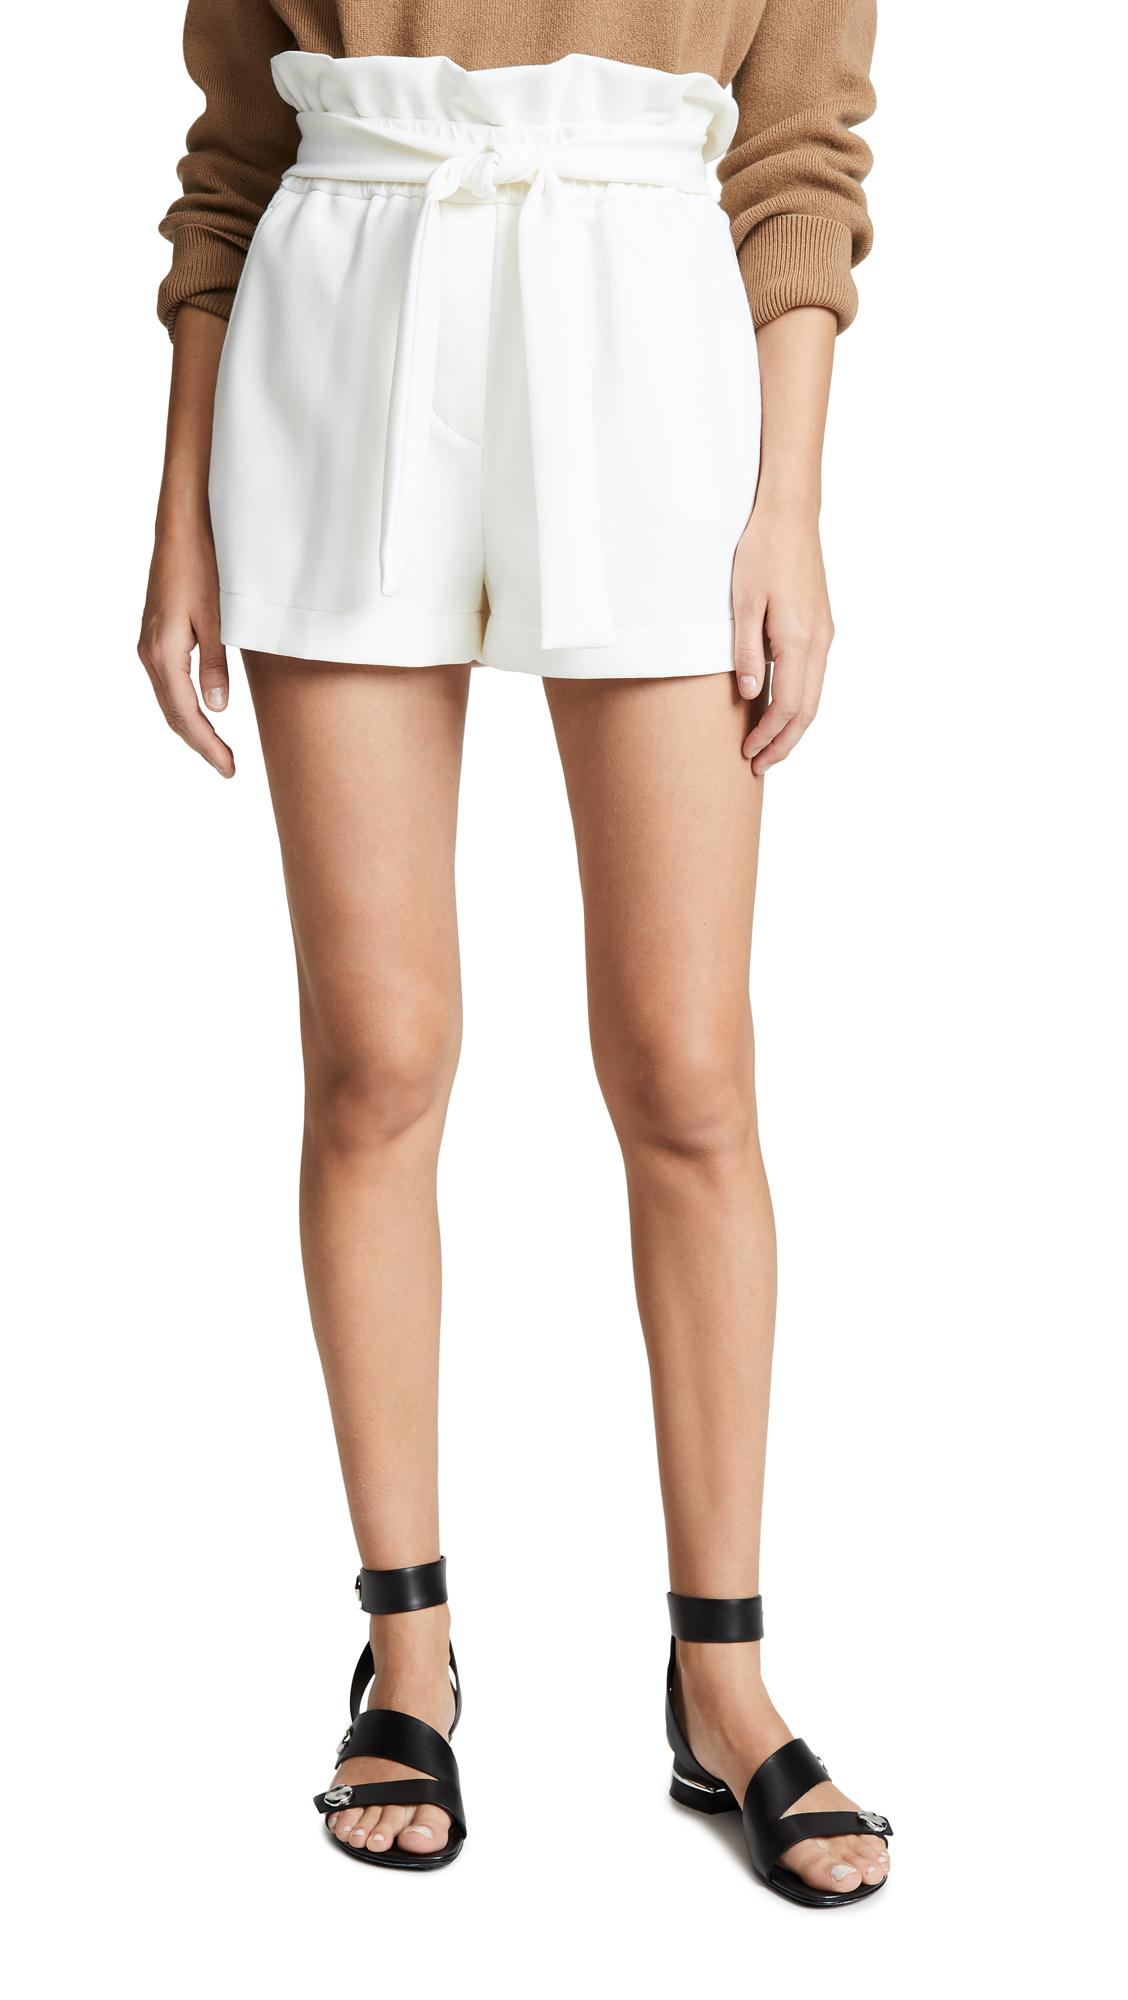 3.1 Phillip Lim Paper Bag Shorts - Ant. White